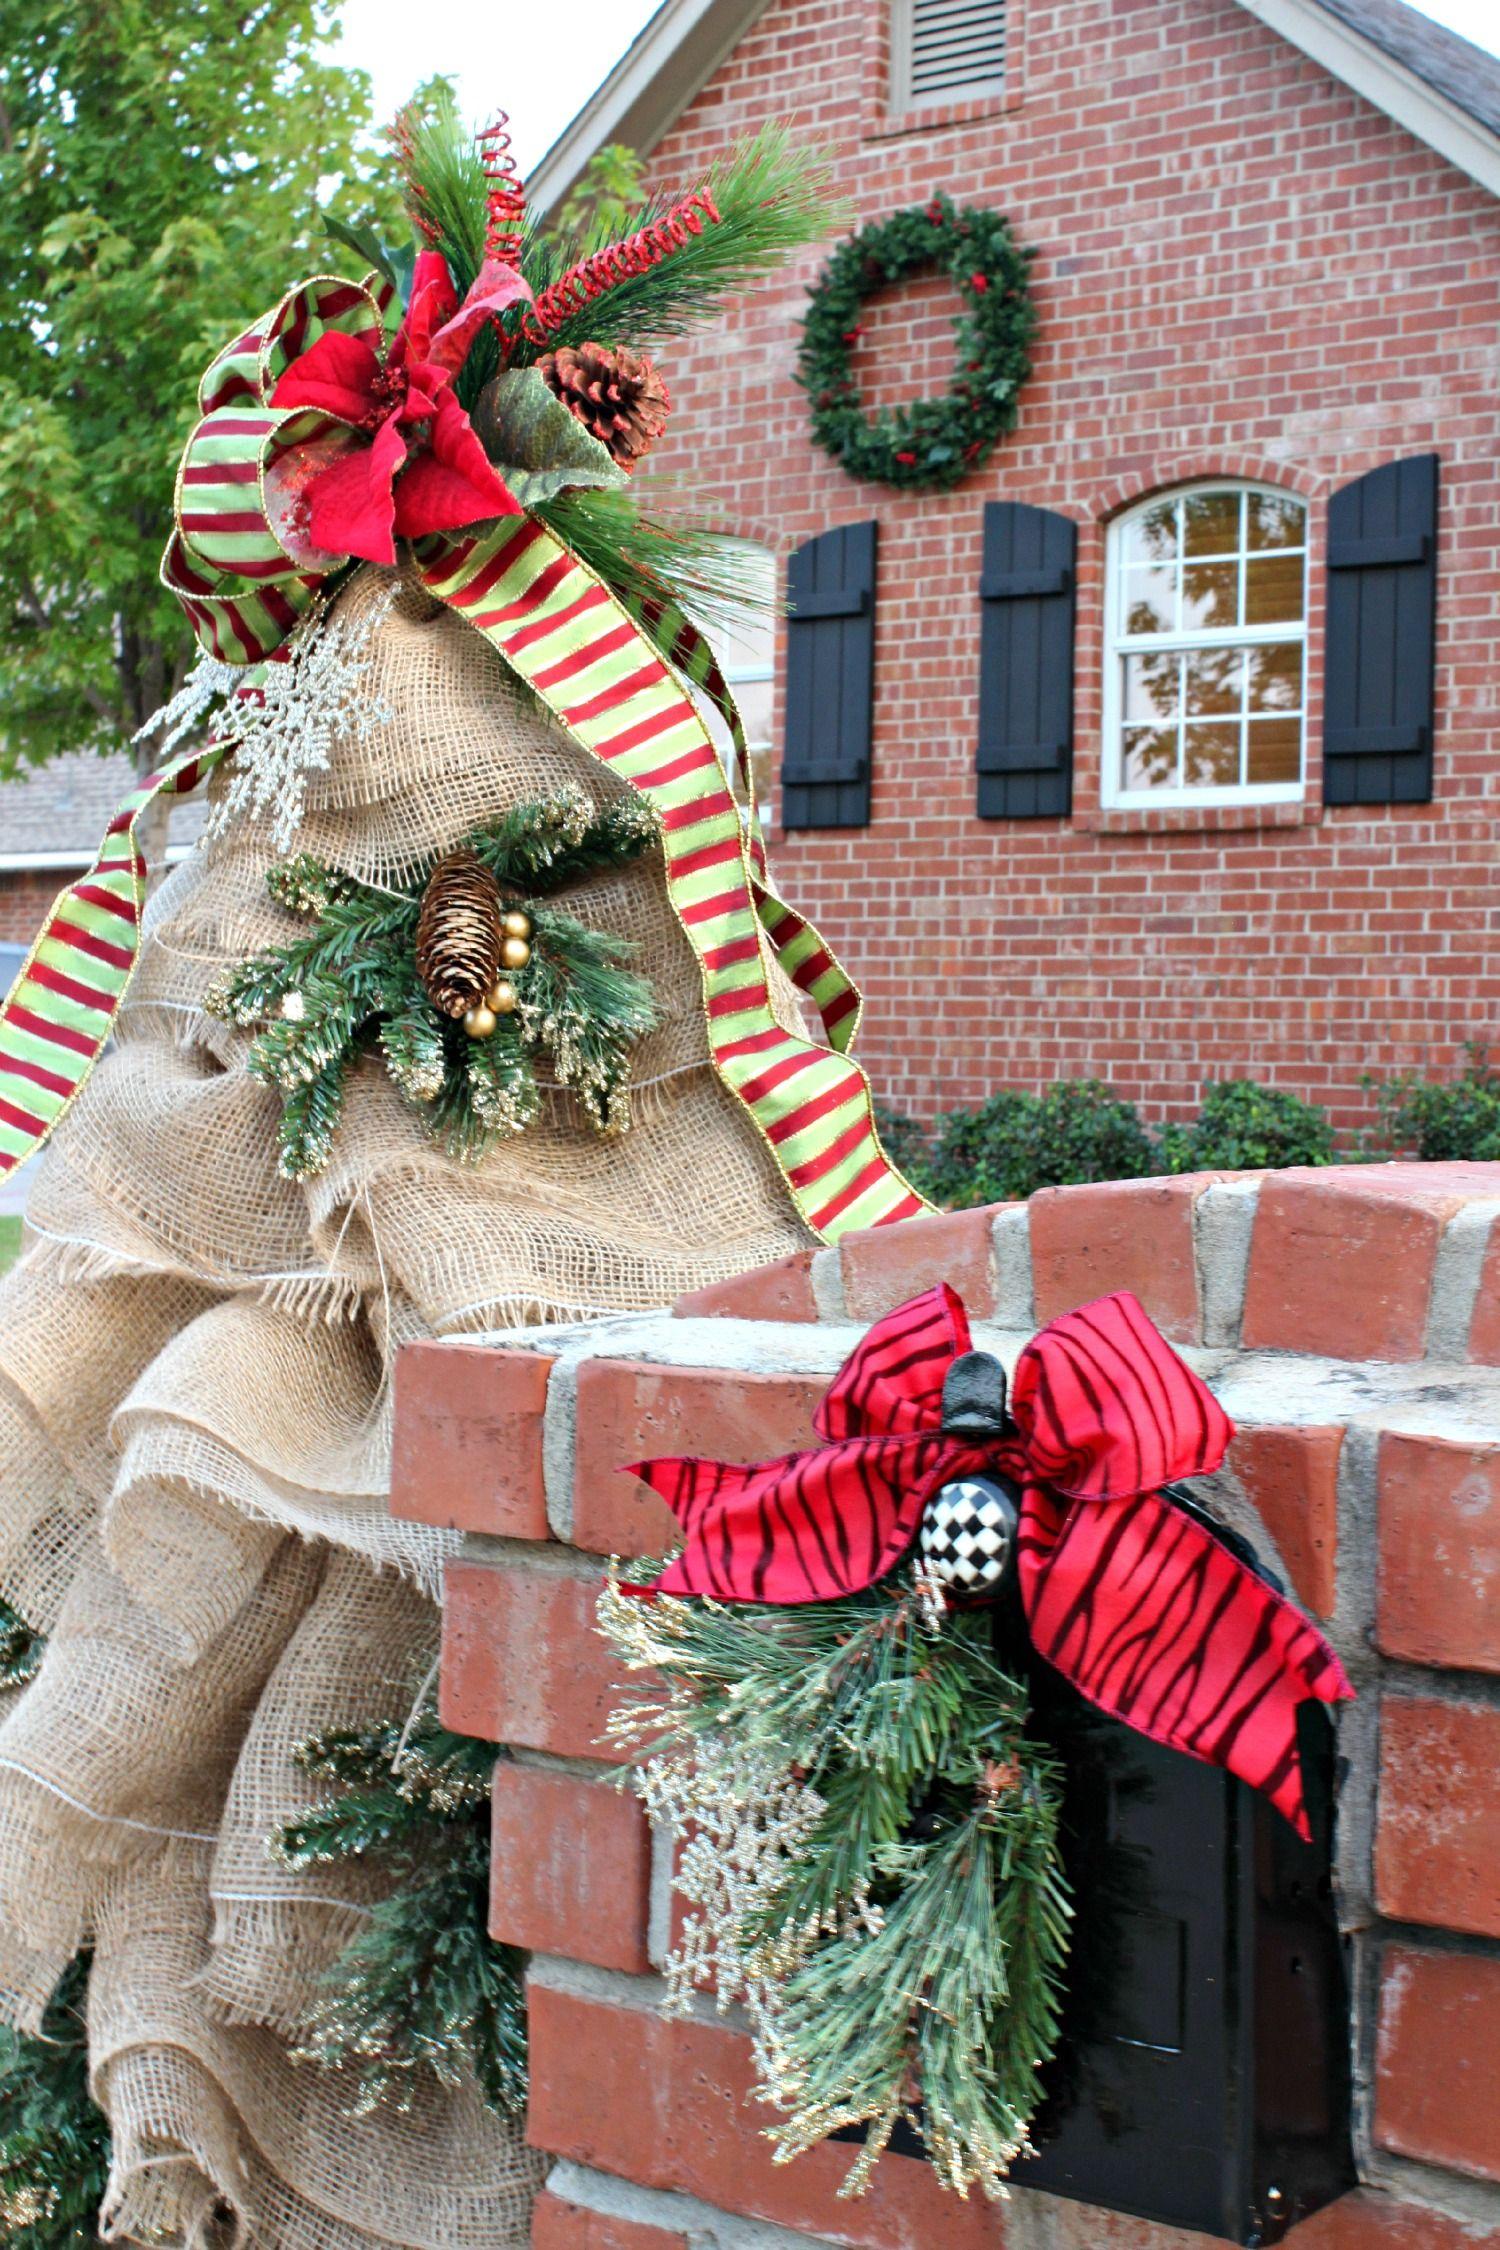 christmas mailbox decorations burlap and greenery - Christmas Mailbox Decorations Ideas